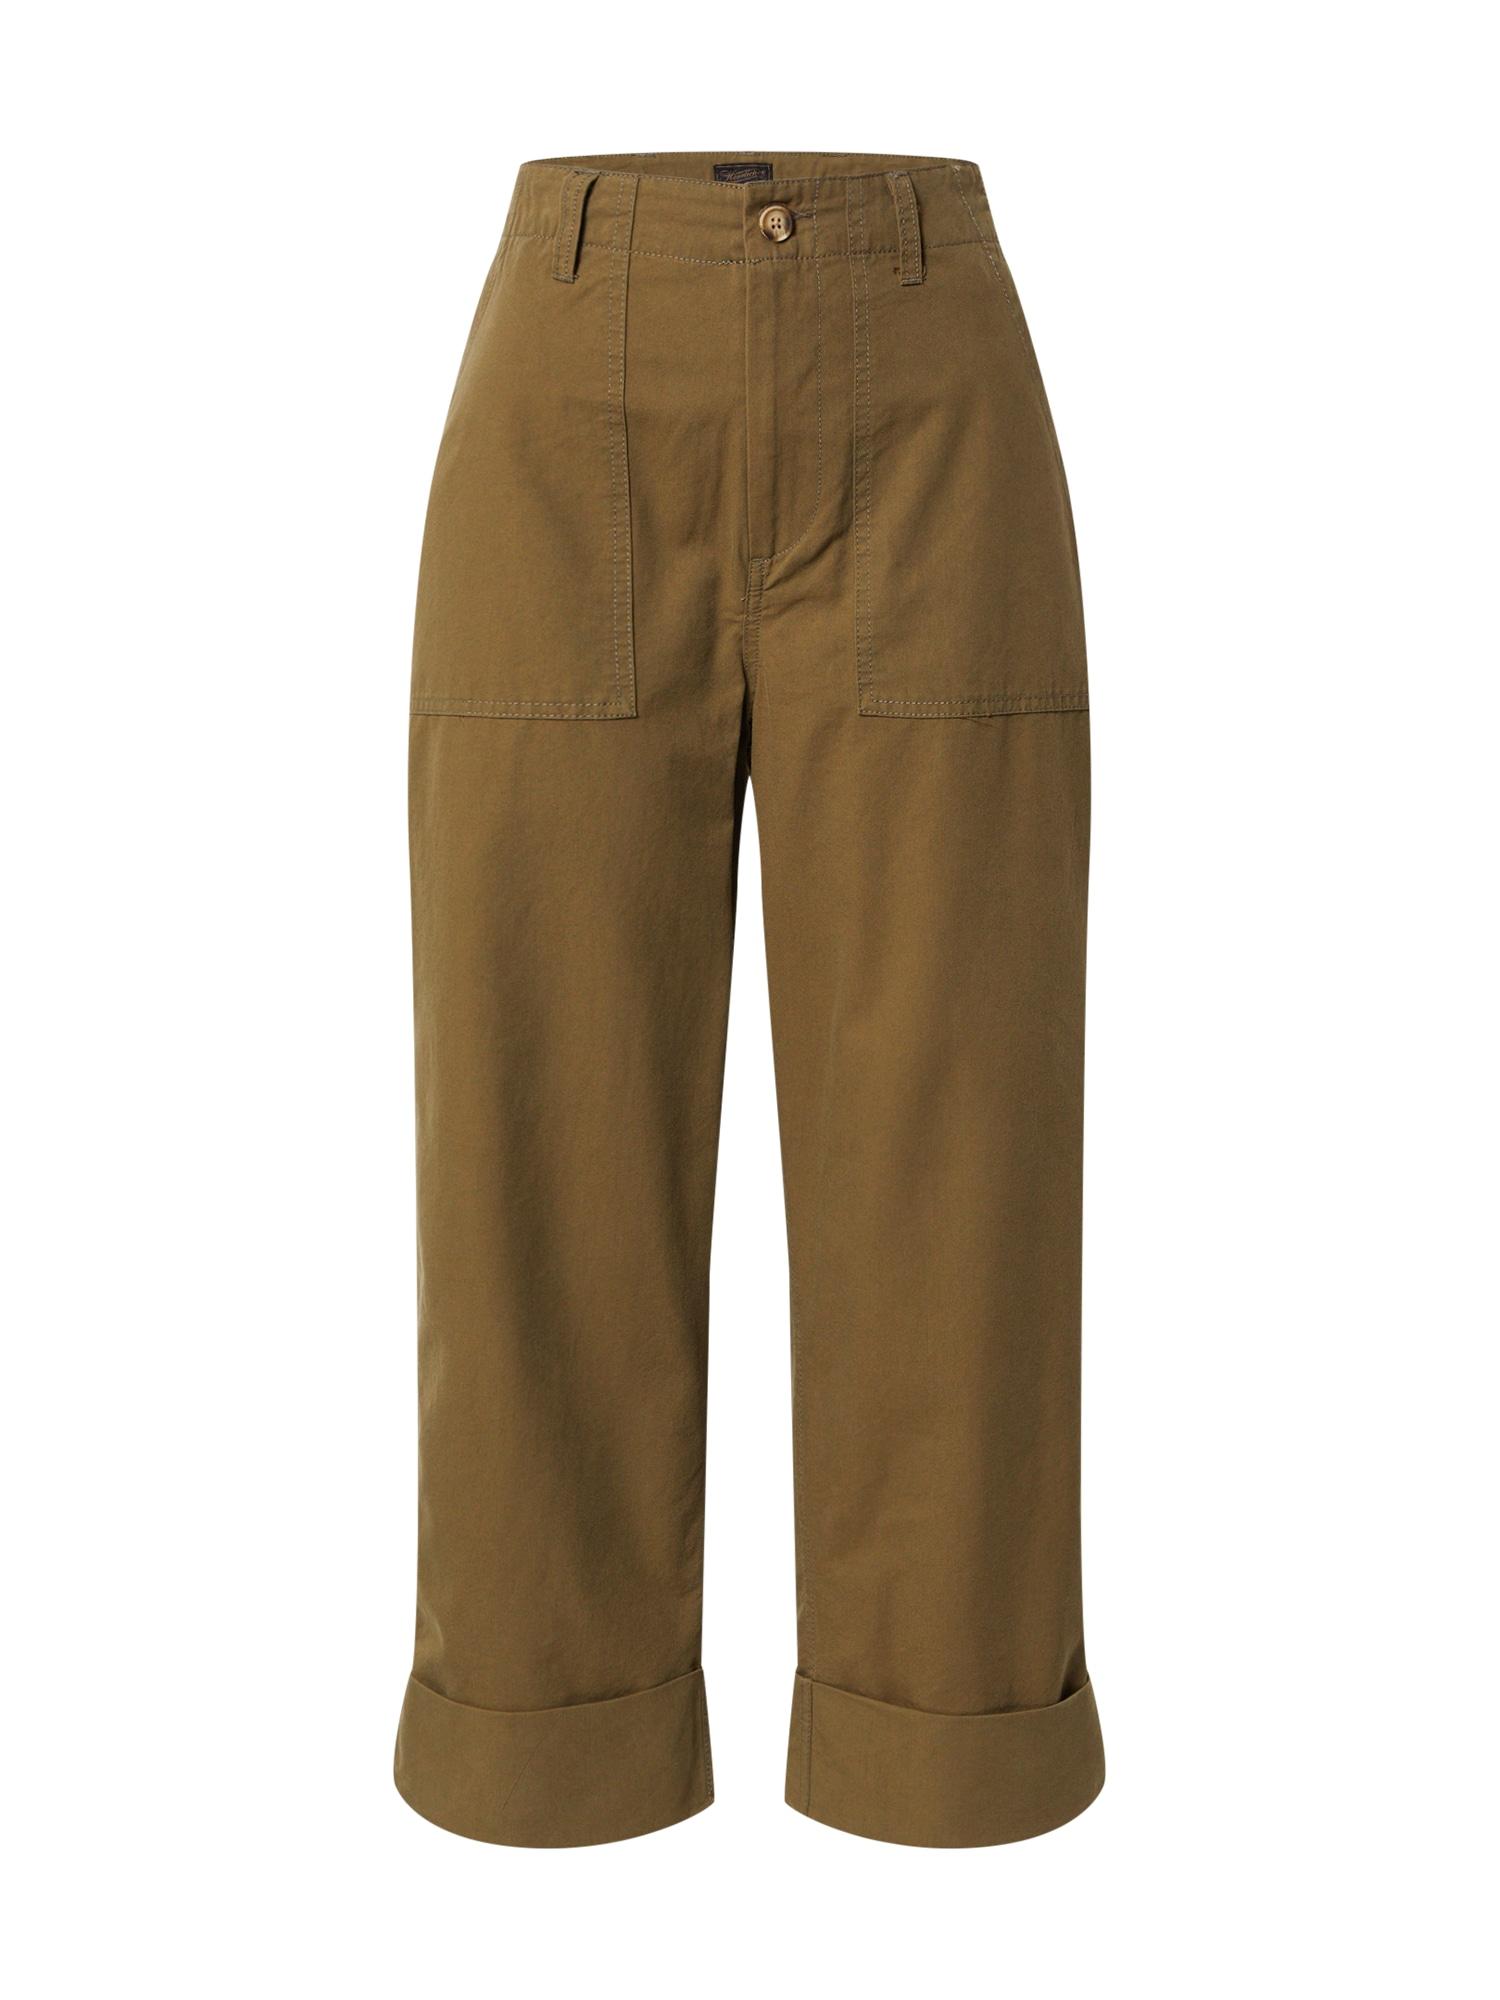 Herrlicher Laisvo stiliaus kelnės 'Nana' alyvuogių spalva